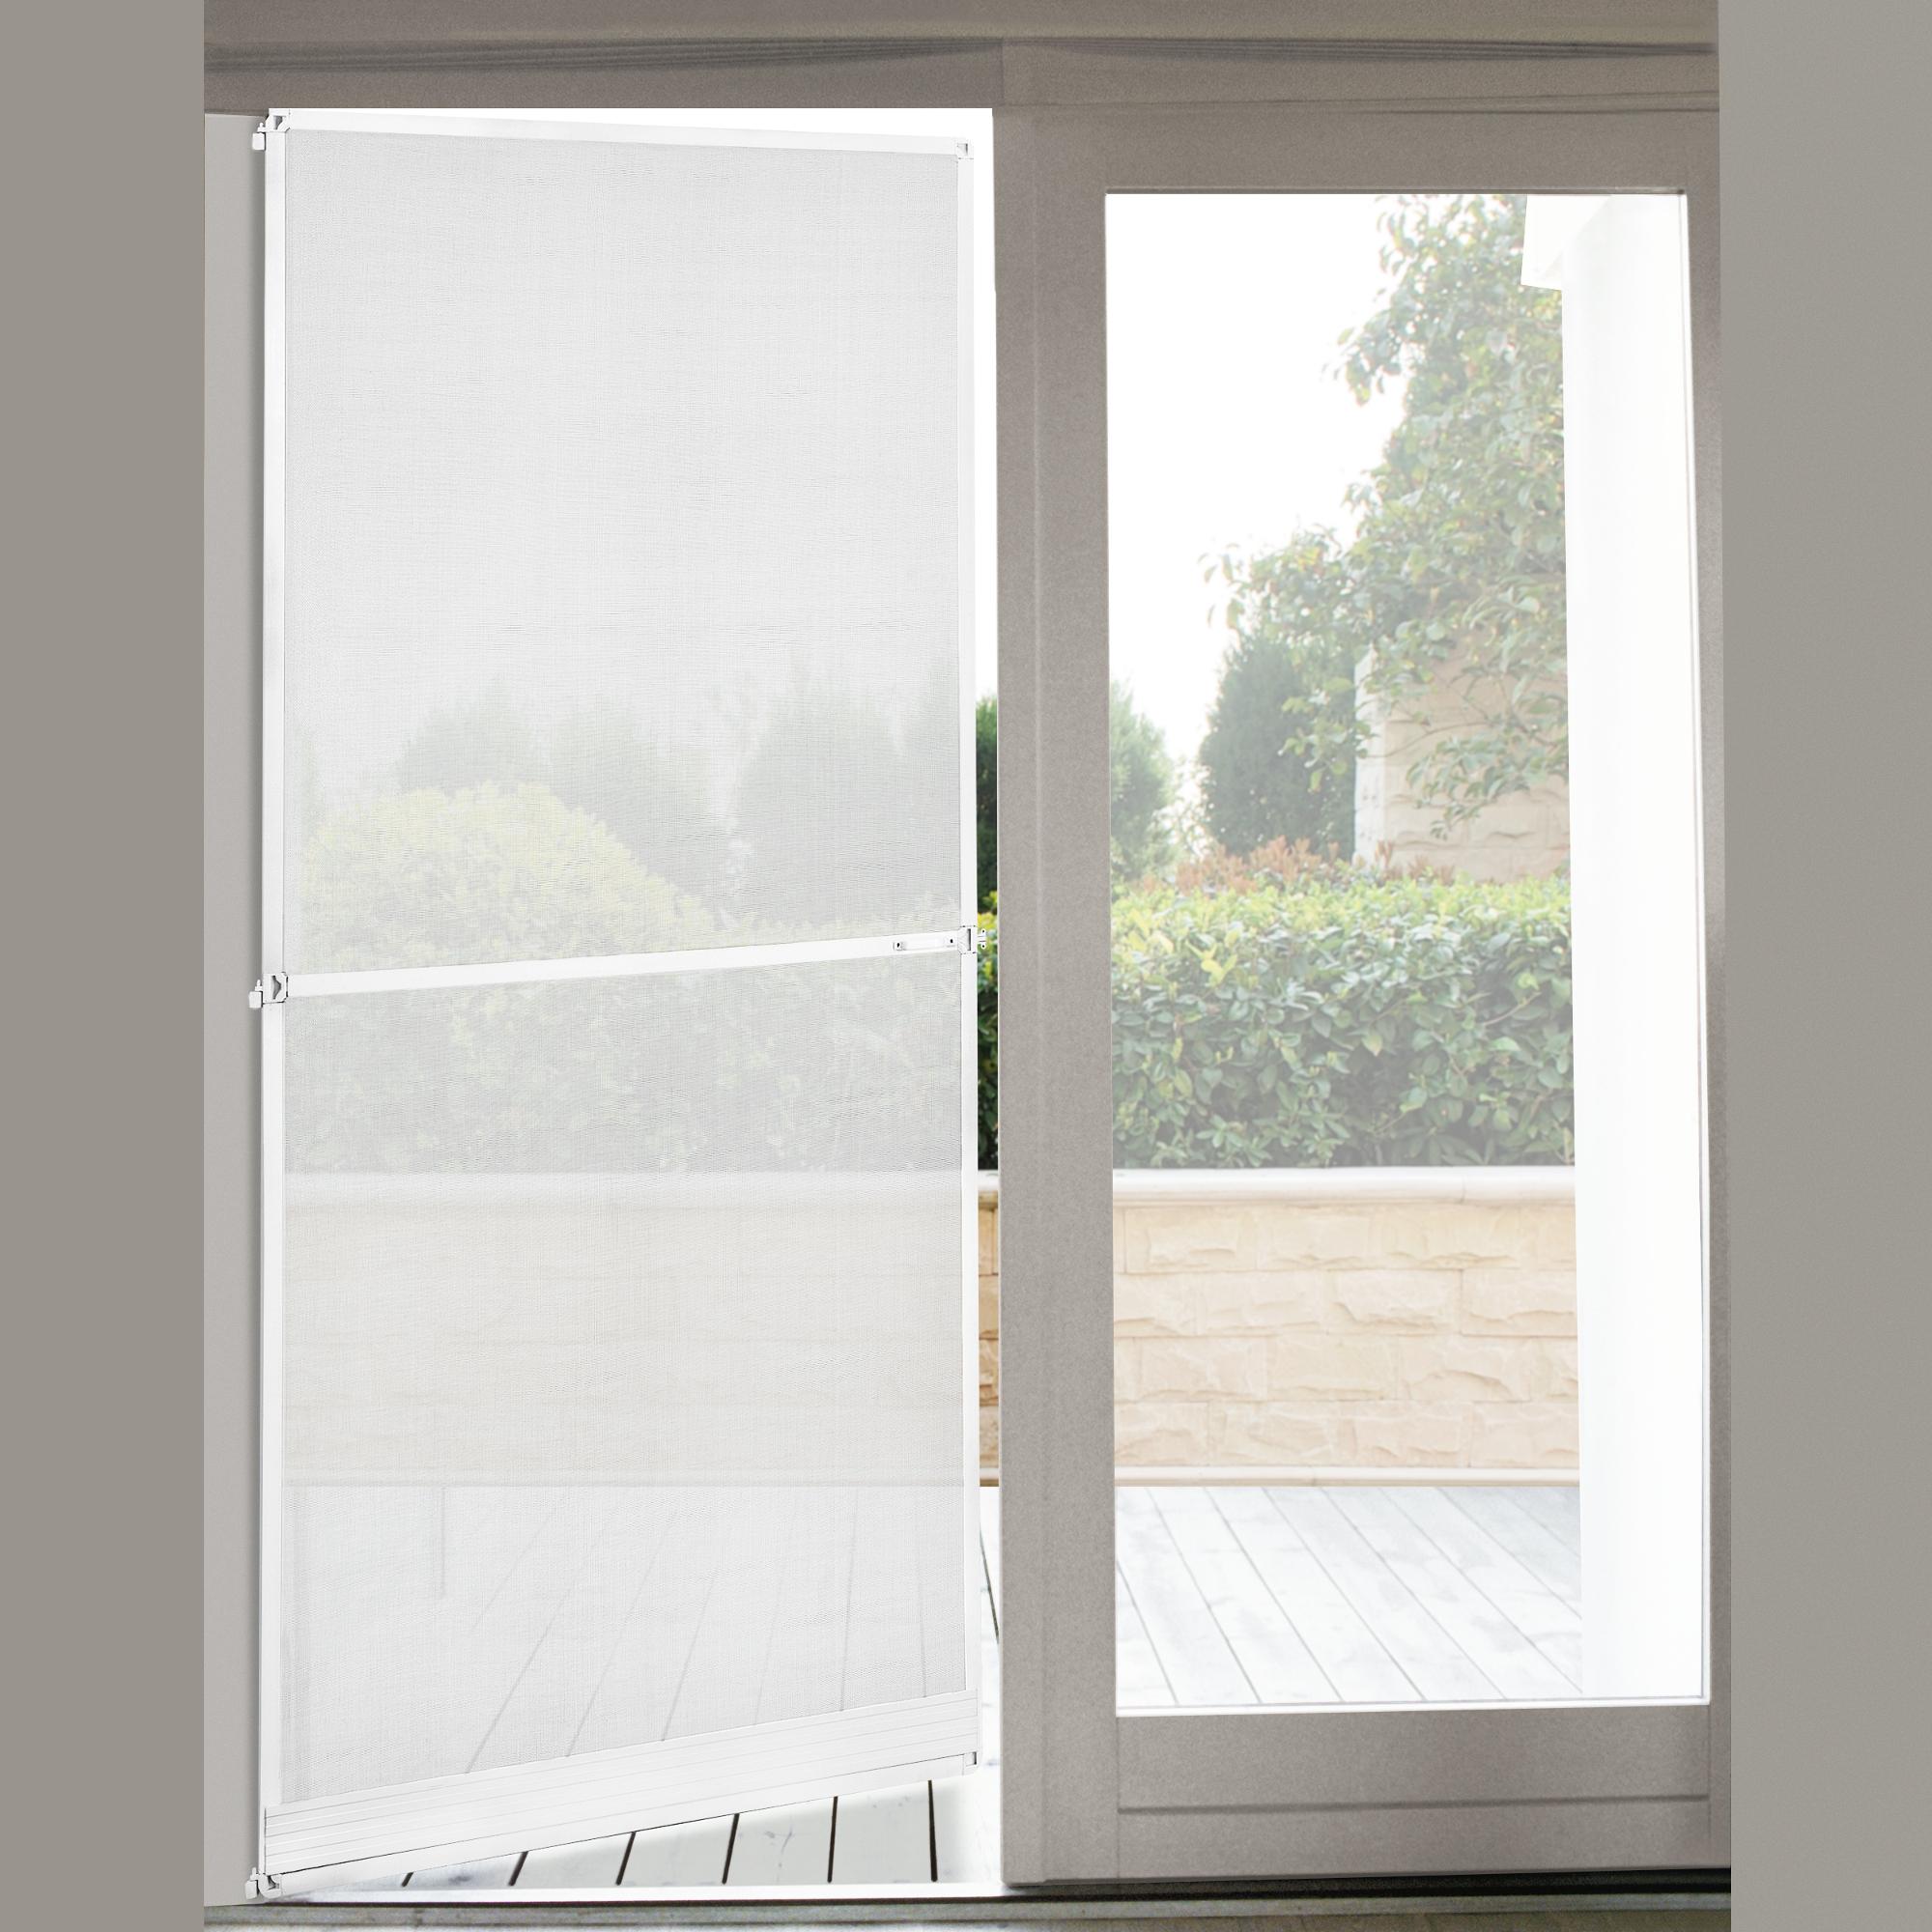 fliegengitter t r alurahmen 100 x 210 cm braun insektenschutz gitter ebay. Black Bedroom Furniture Sets. Home Design Ideas